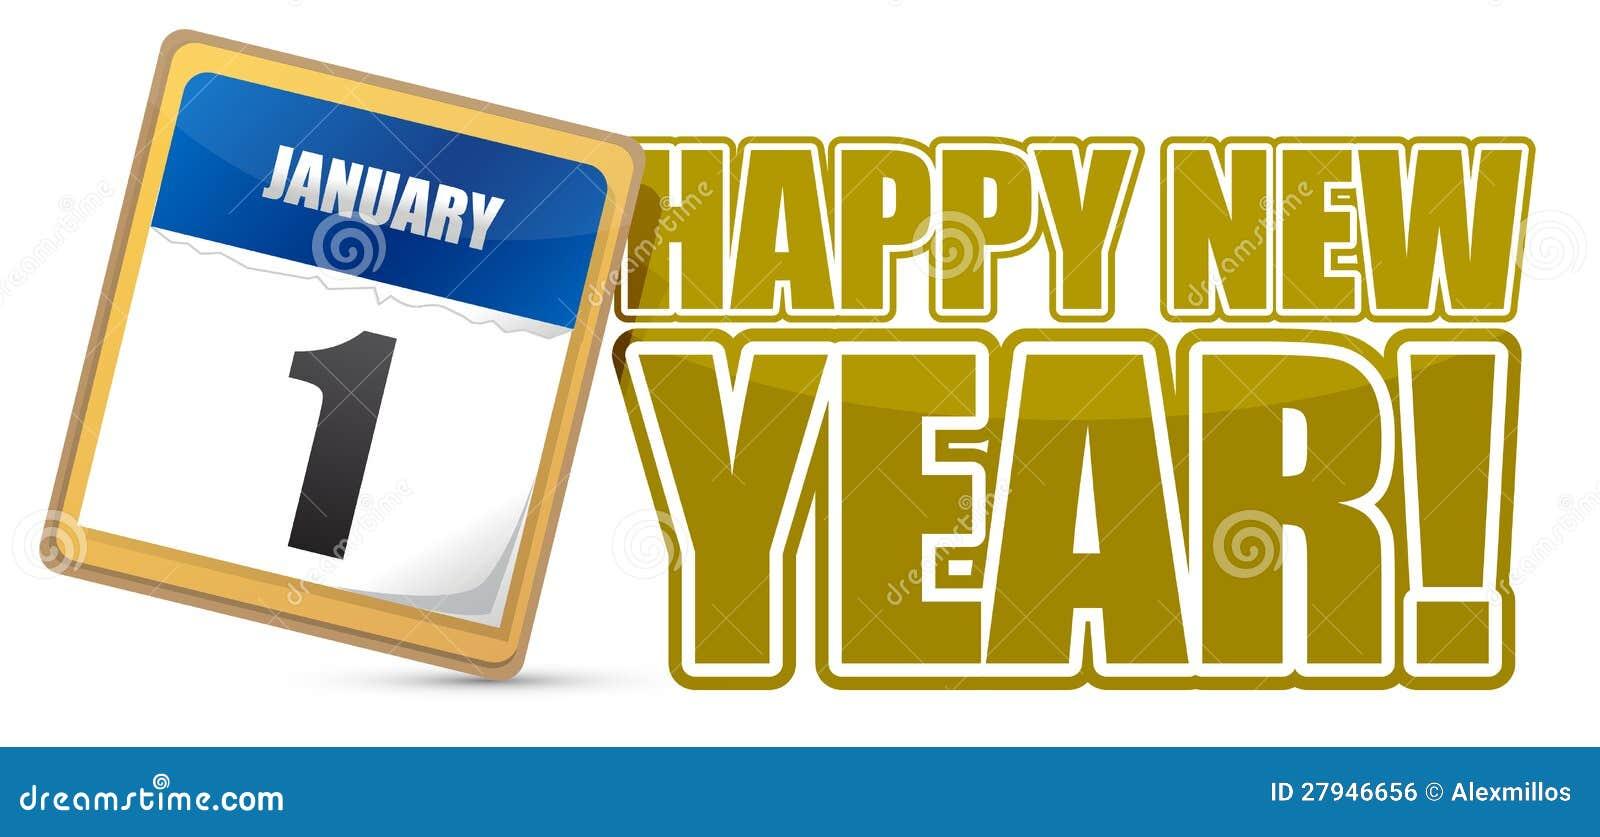 Happy New Year Calendar : Happy new year sign calendar royalty free stock image